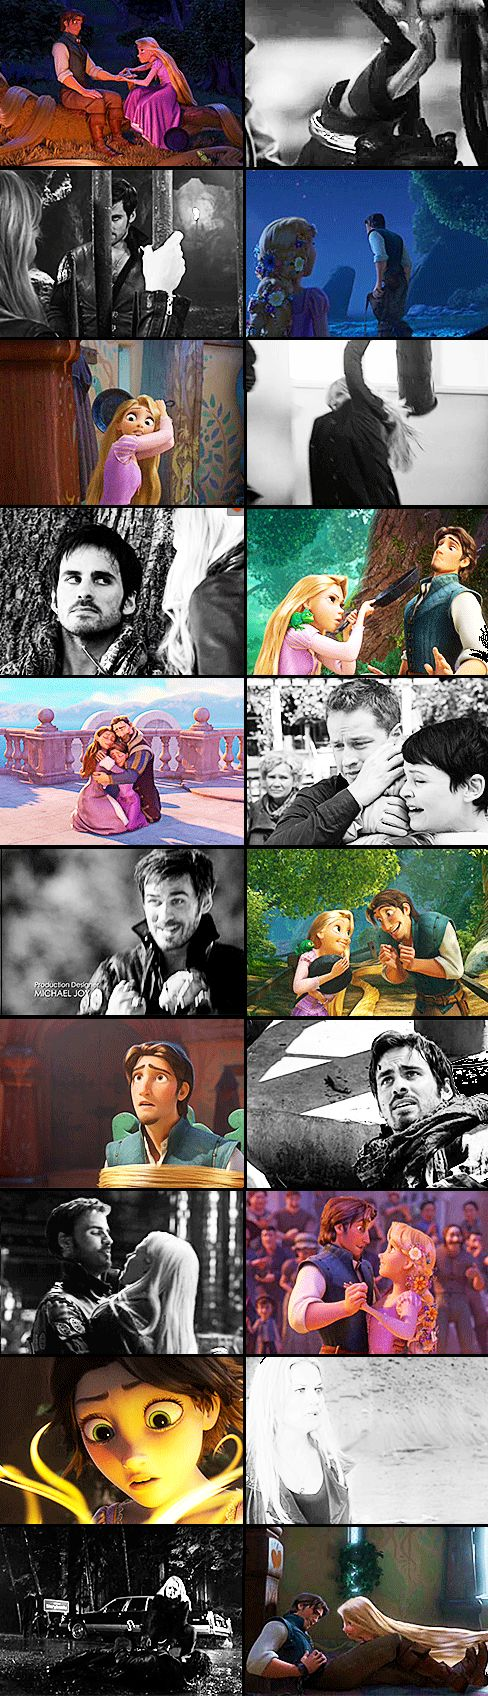 Captain Swan ouat ( Hook & Emma ) and Tangled ( Flynn Rider & Rapunzel ) - PARALLELS ❤